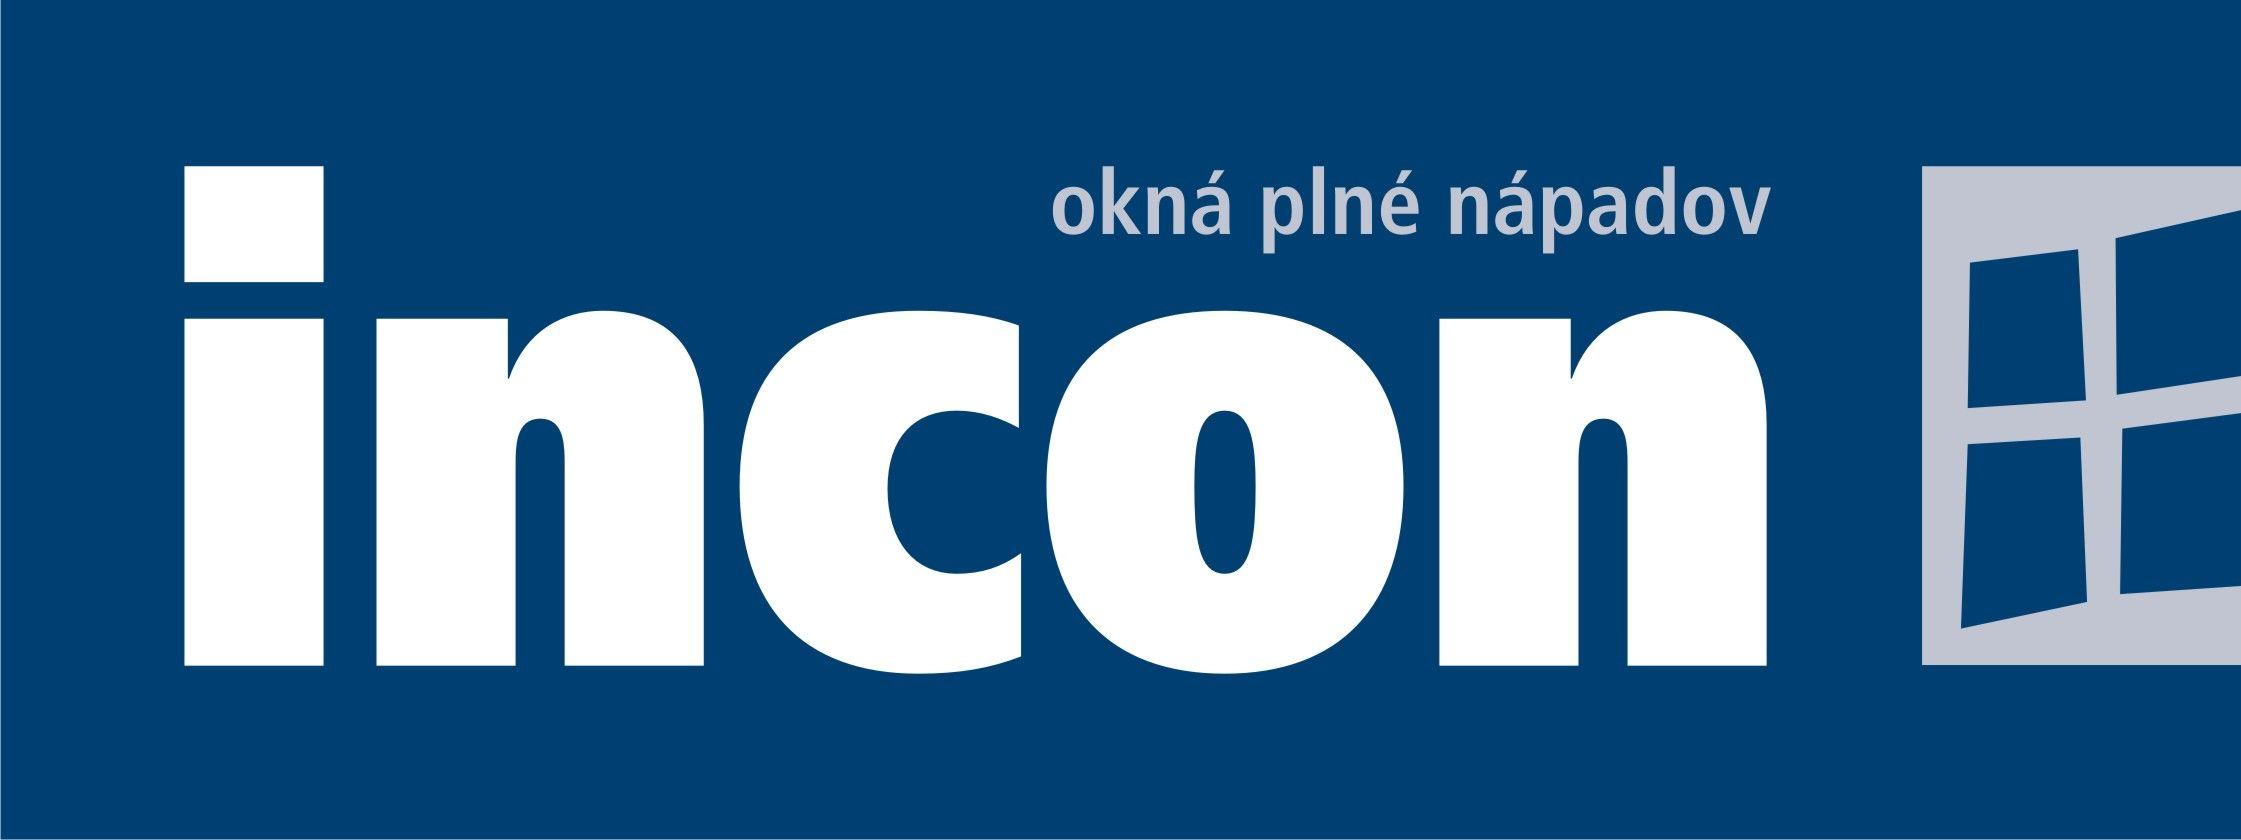 incon okná logo